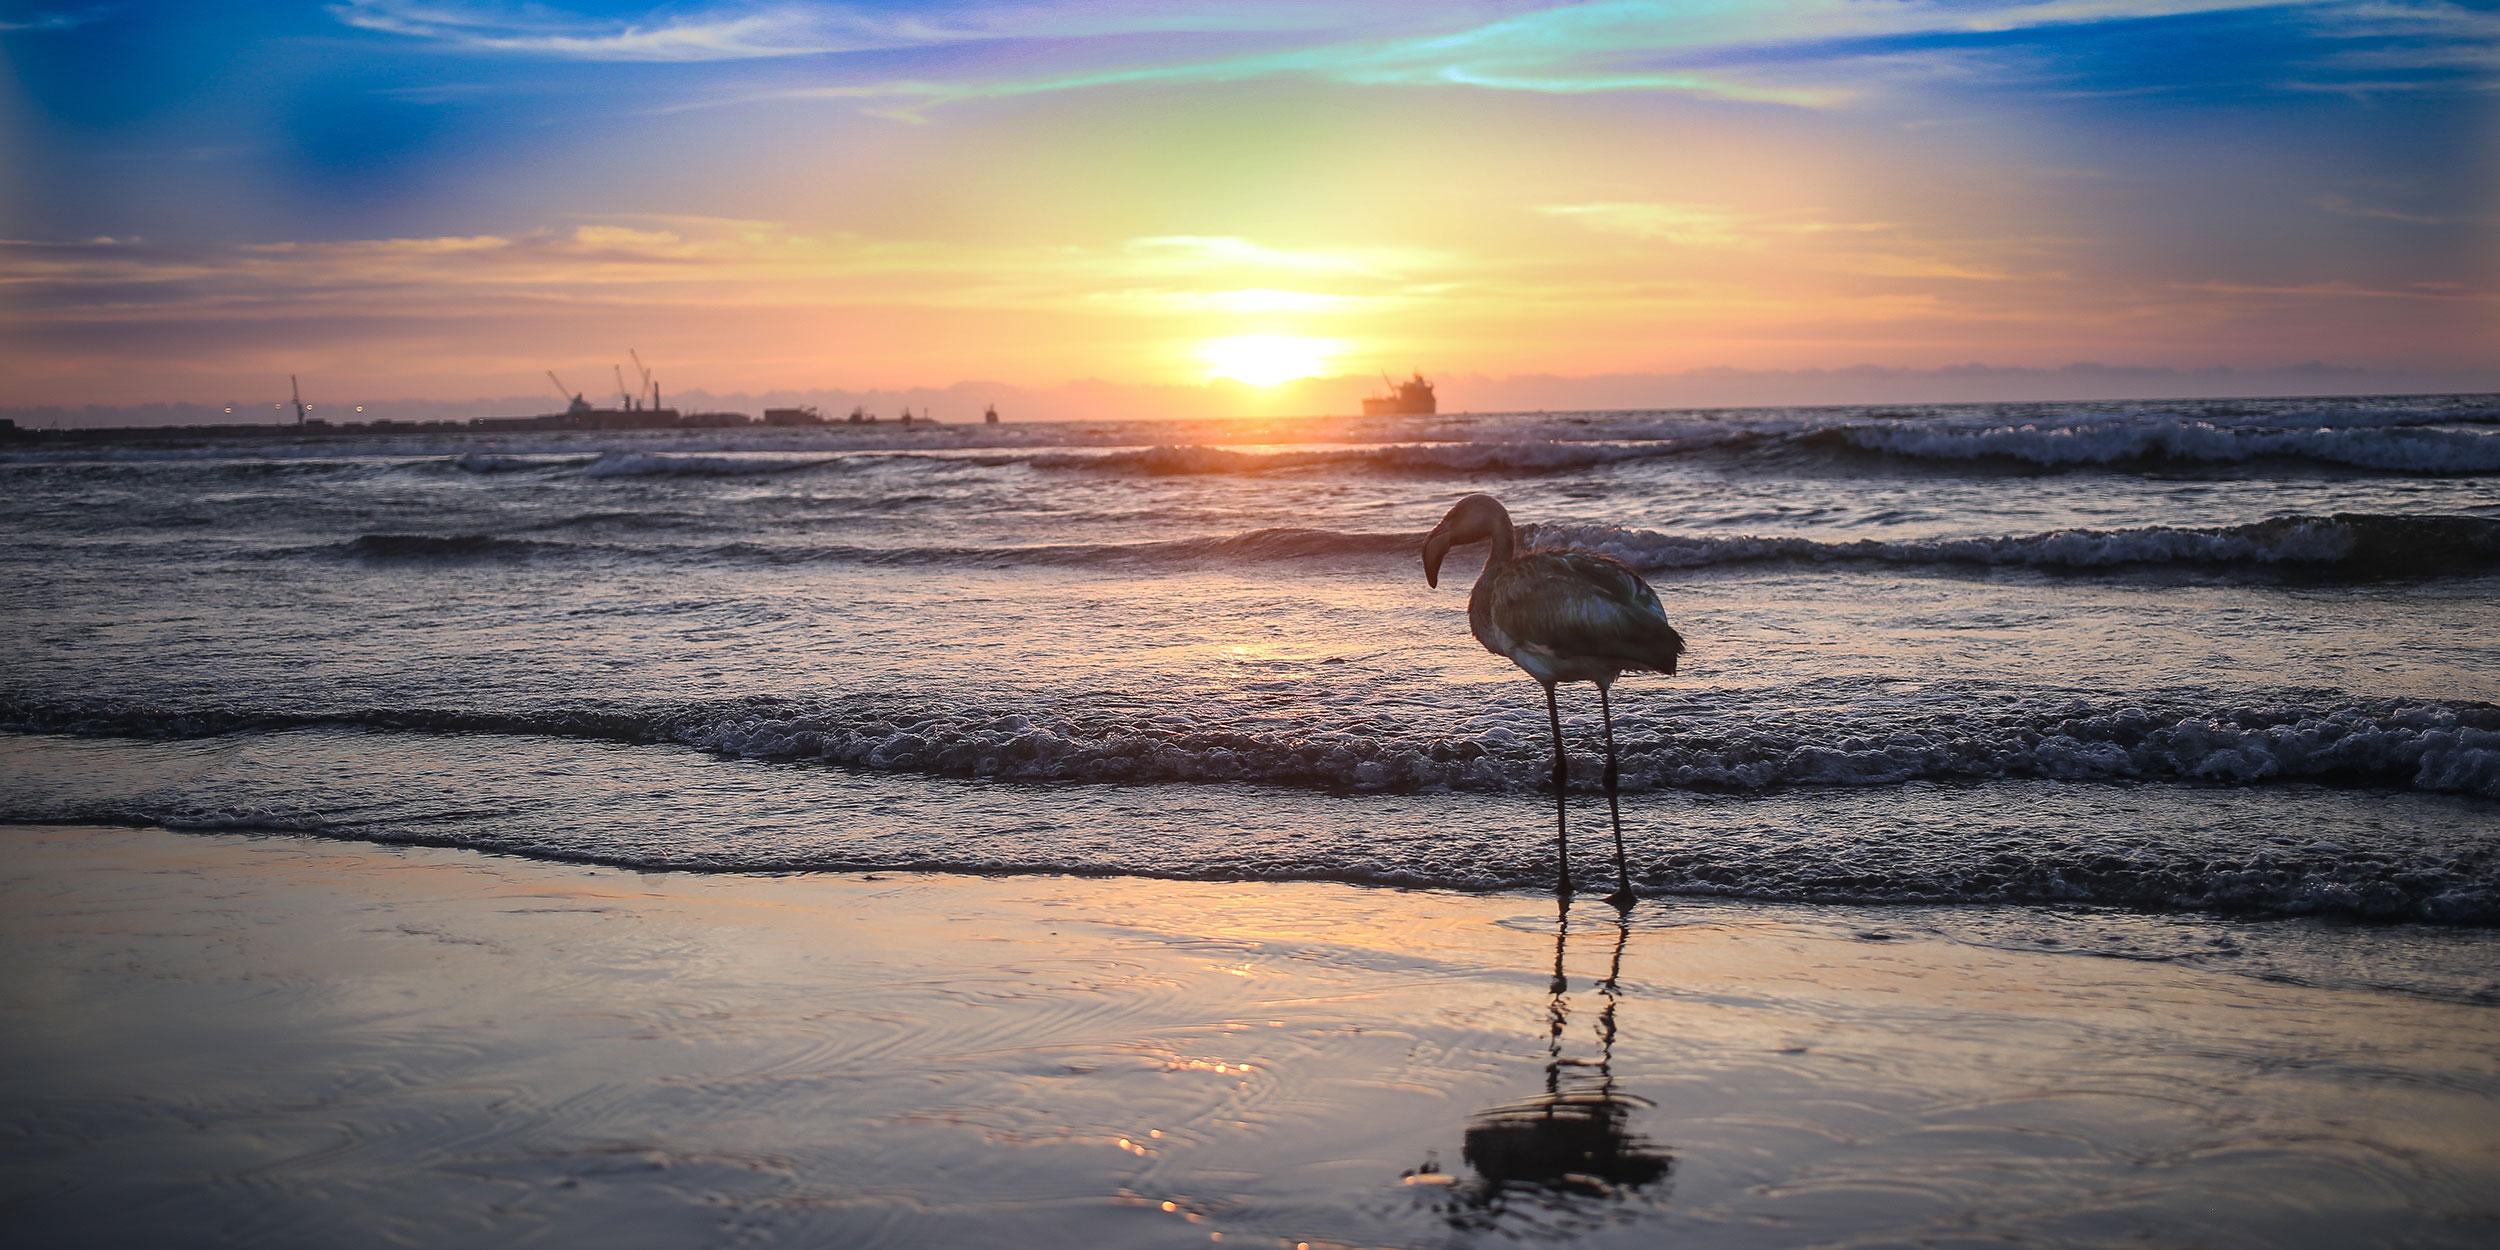 day-5_arica-arica-beach_shutterstock